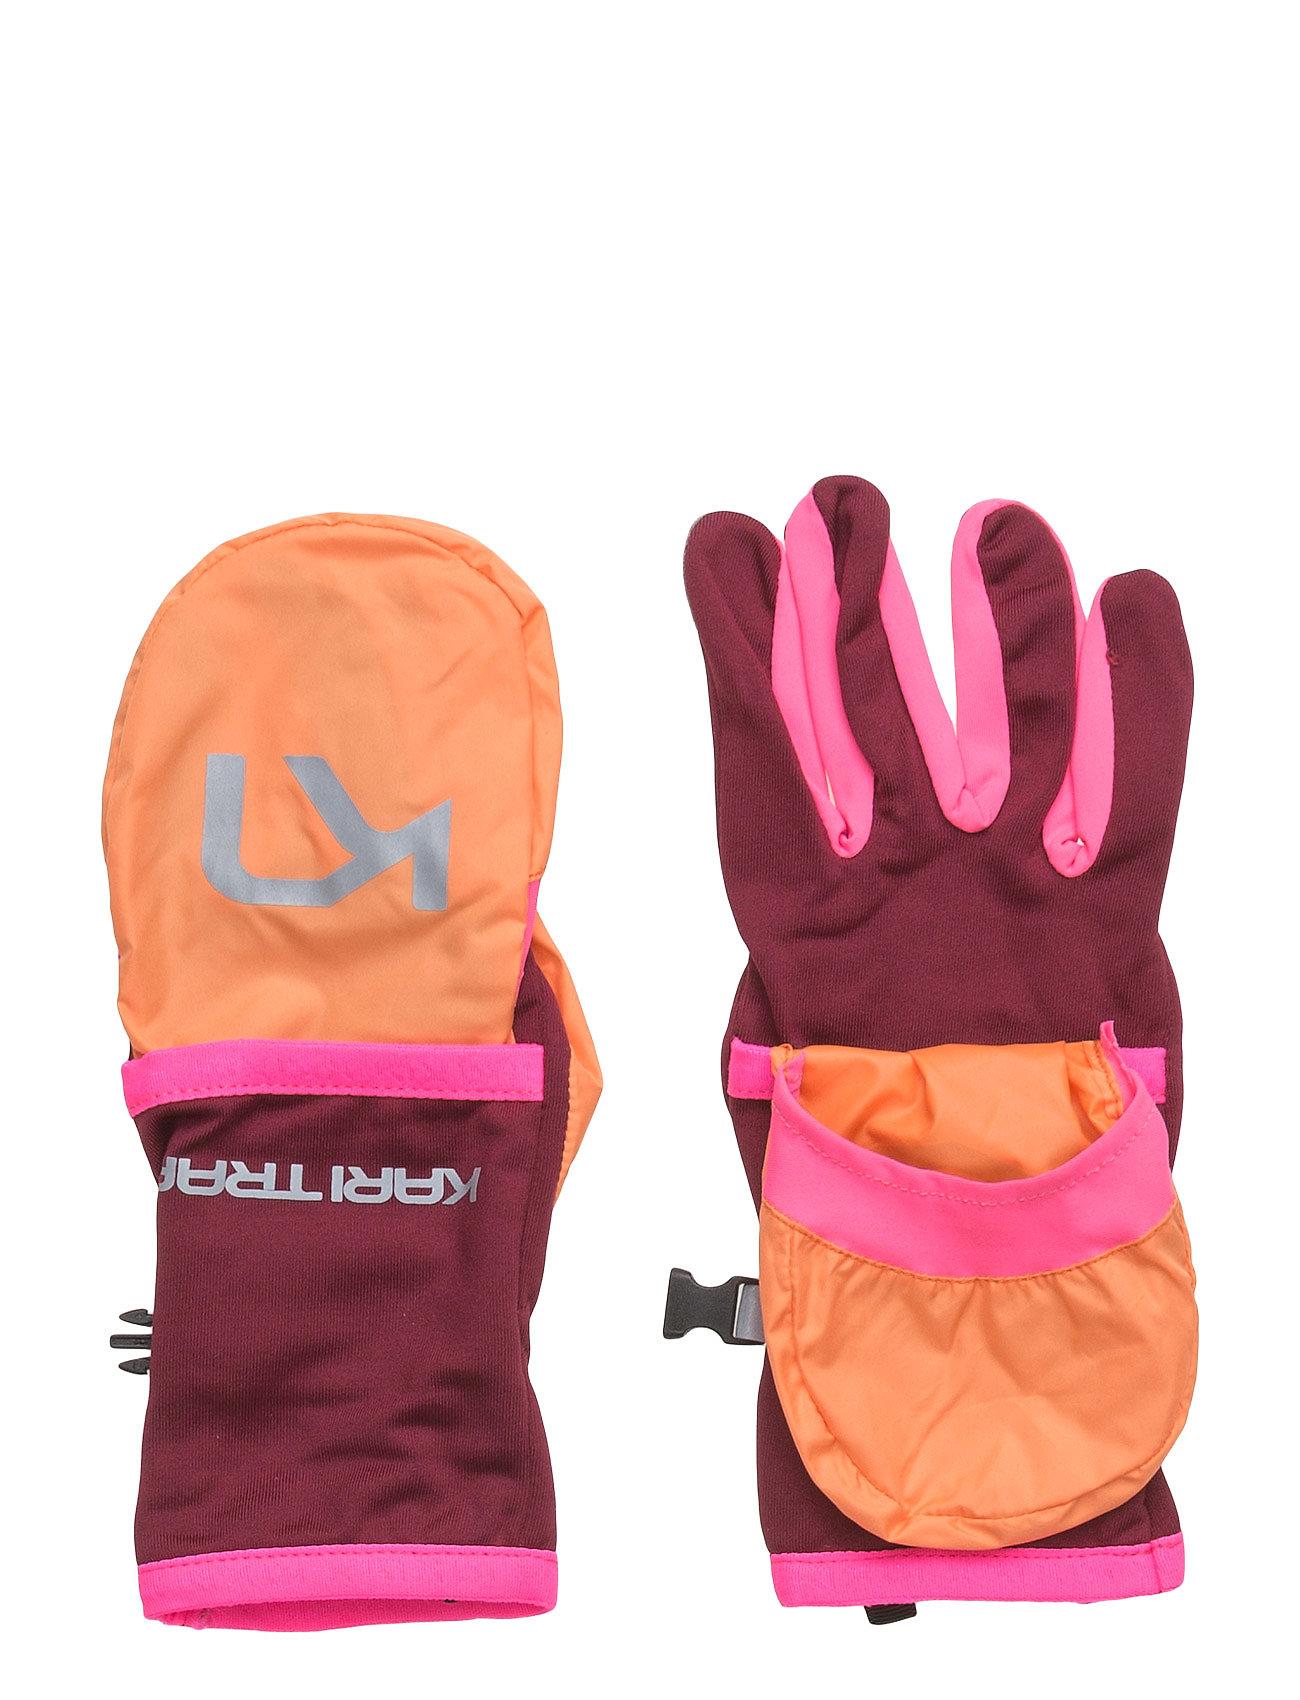 Louise Glove Kari Traa Sports accessories til Damer i